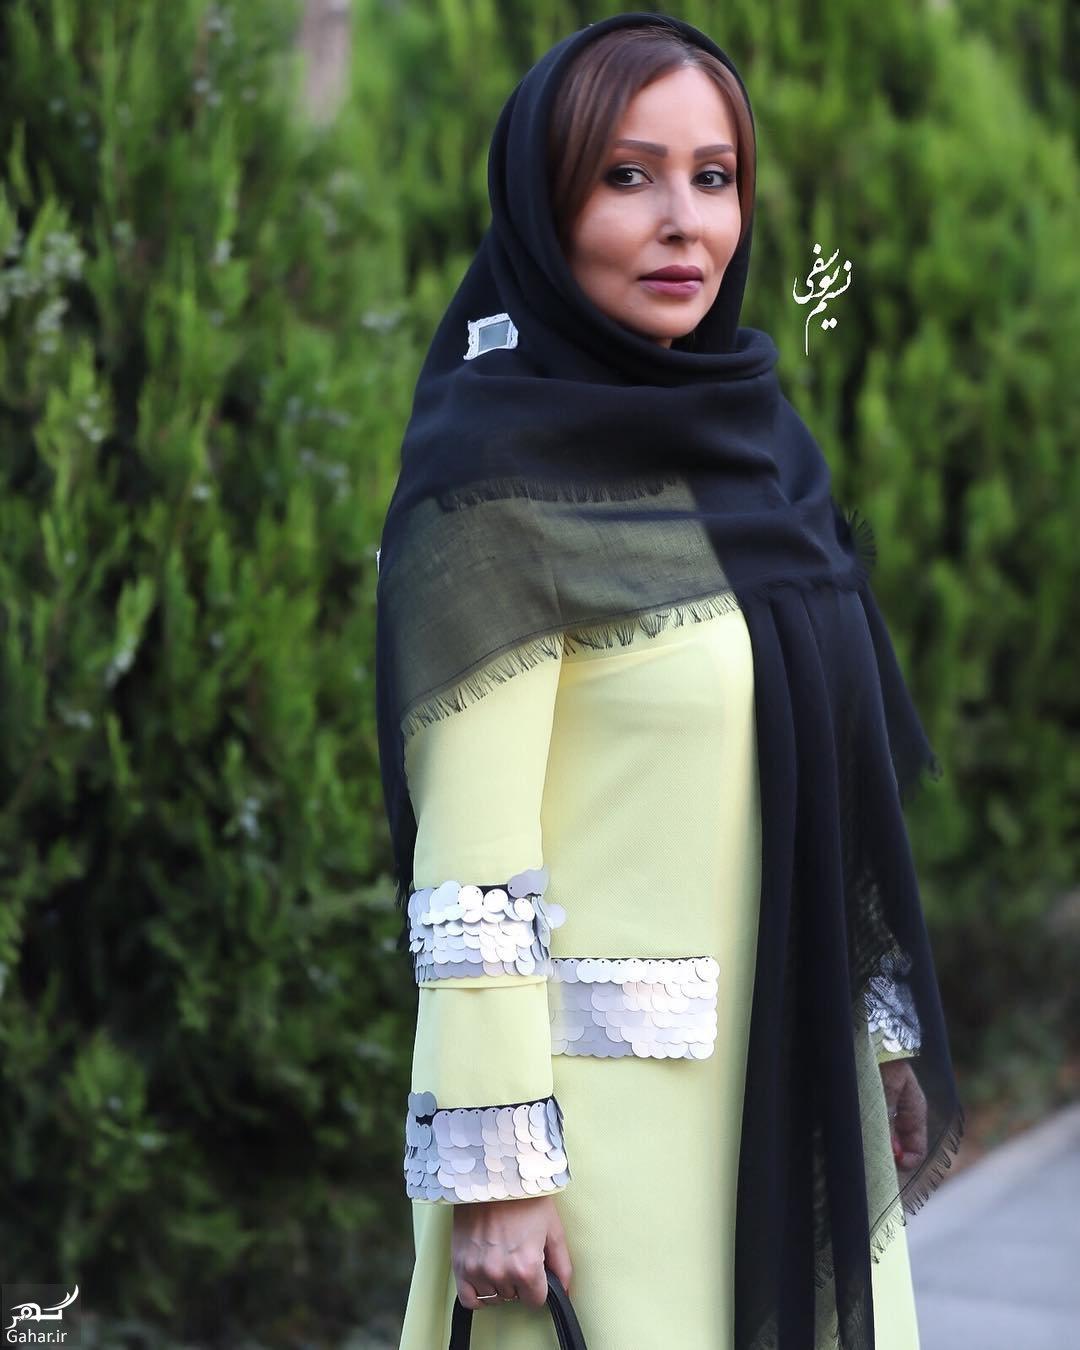 031772 Gahar ir عکس های جدید بازیگران در مراسم جشن عکاسان سینمای ایران